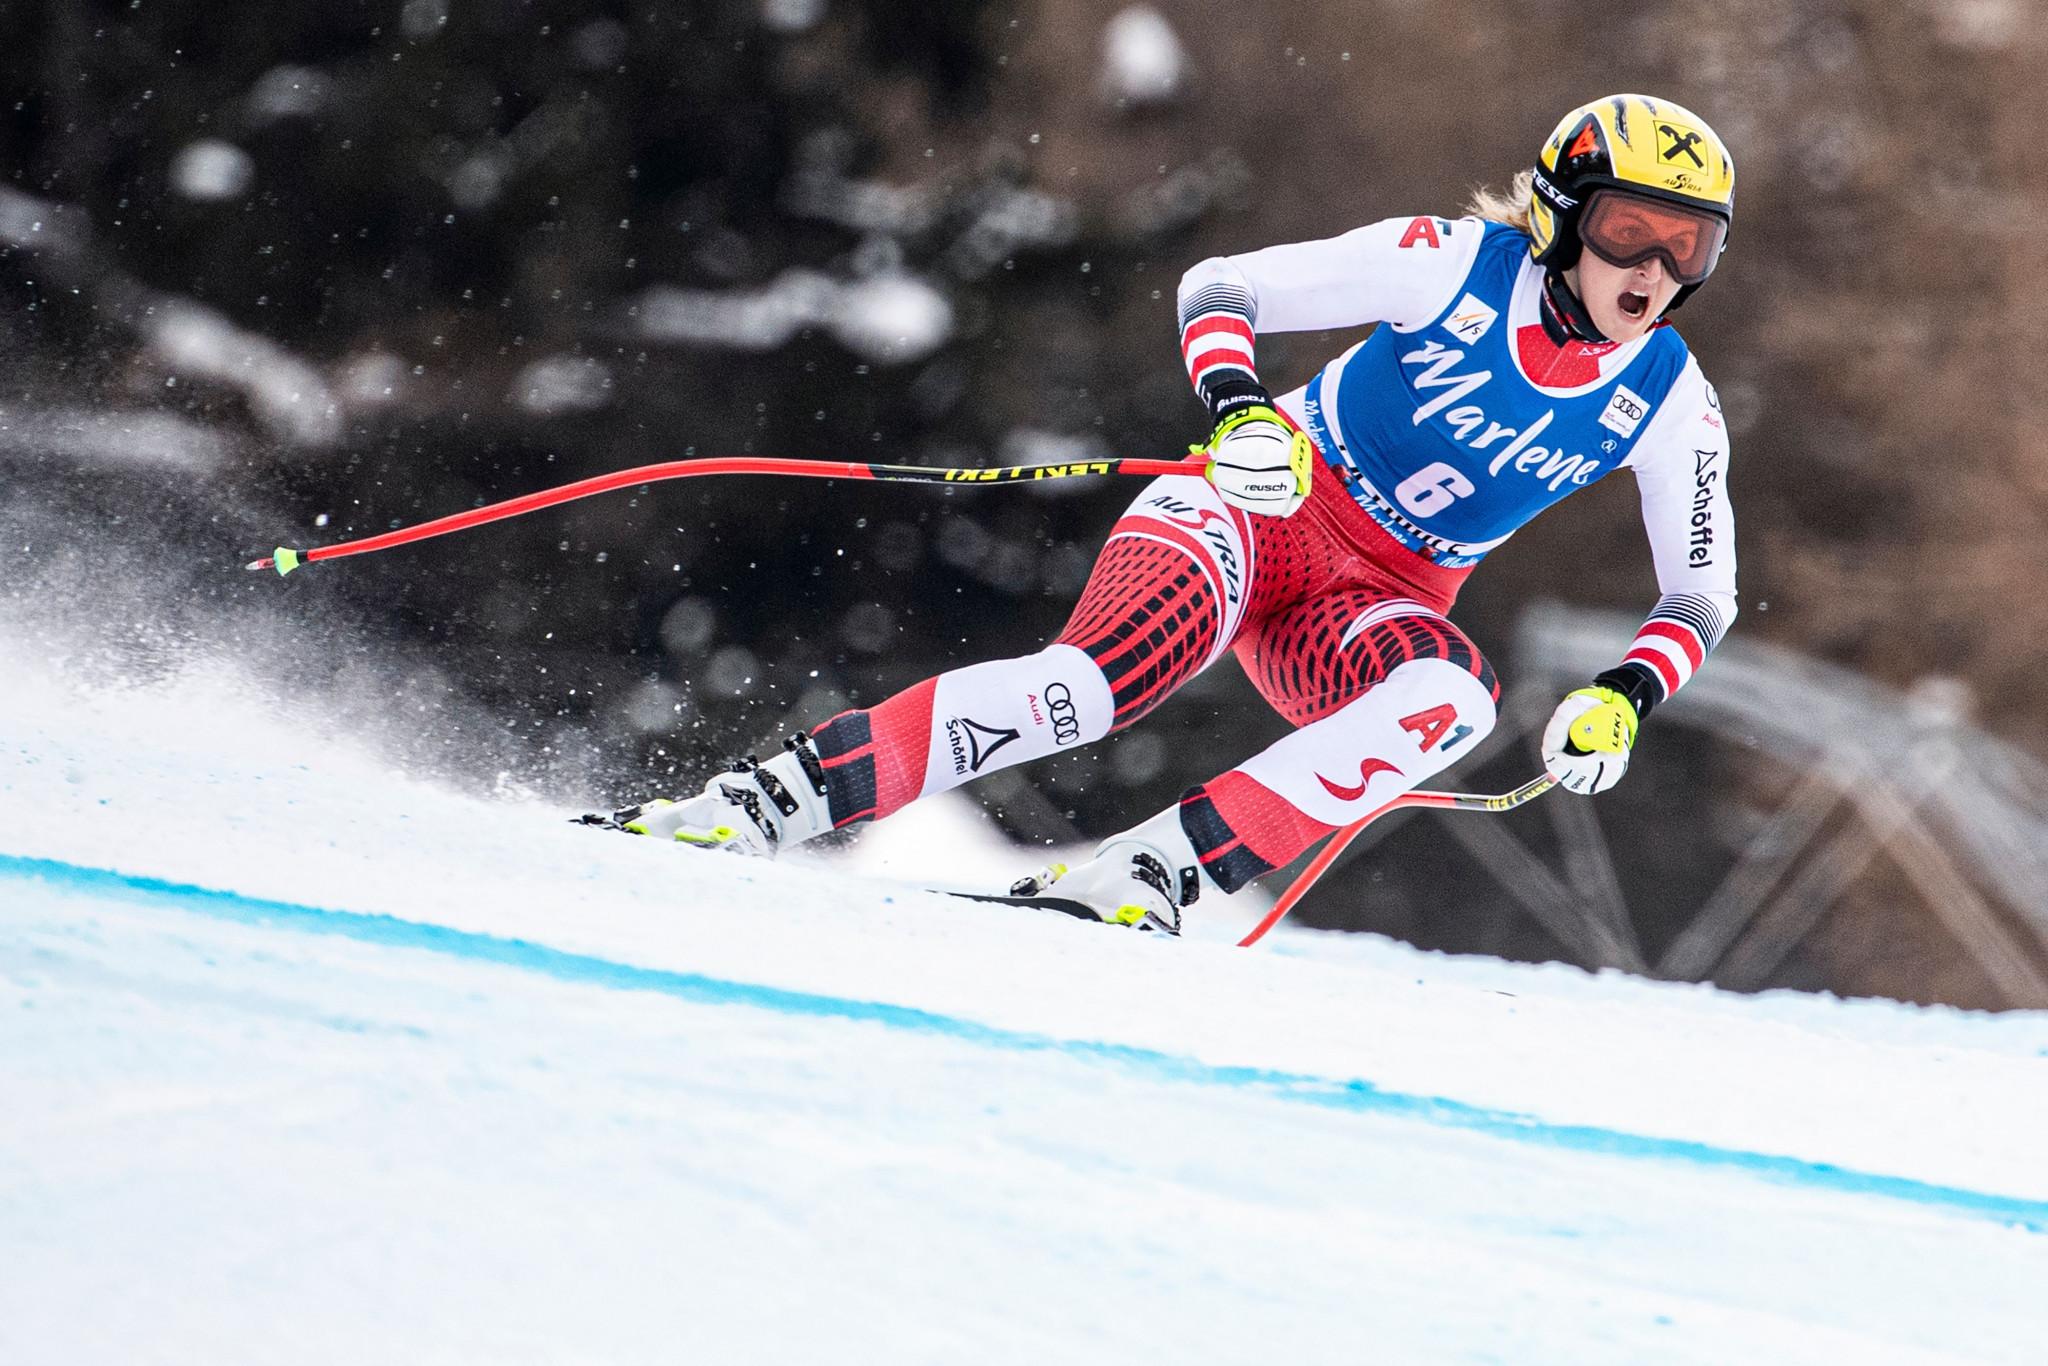 Ortlieb earns first FIS Alpine Skiing World Cup win in La Thuile